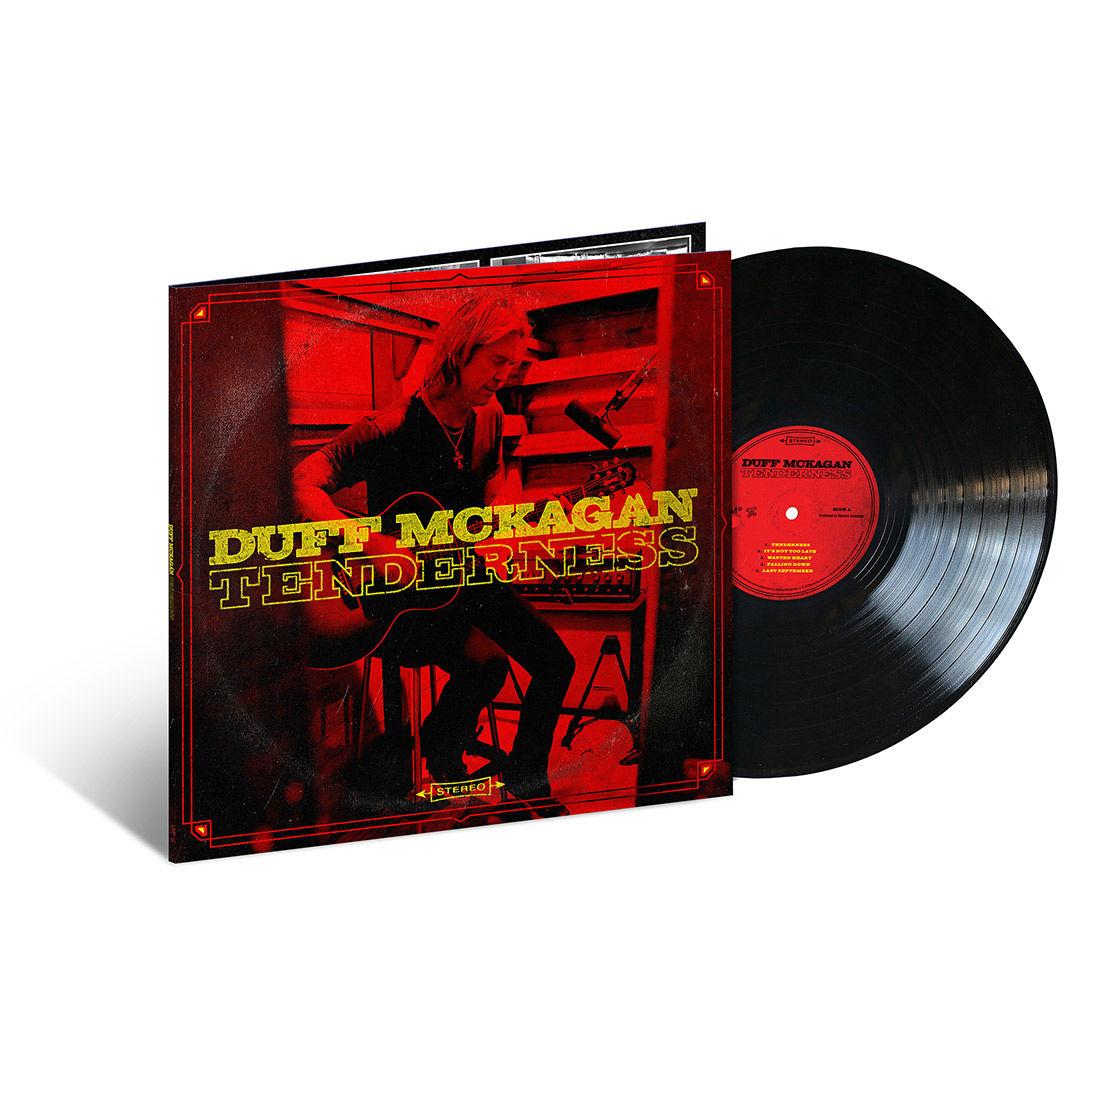 Duff McKagan – Tenderness